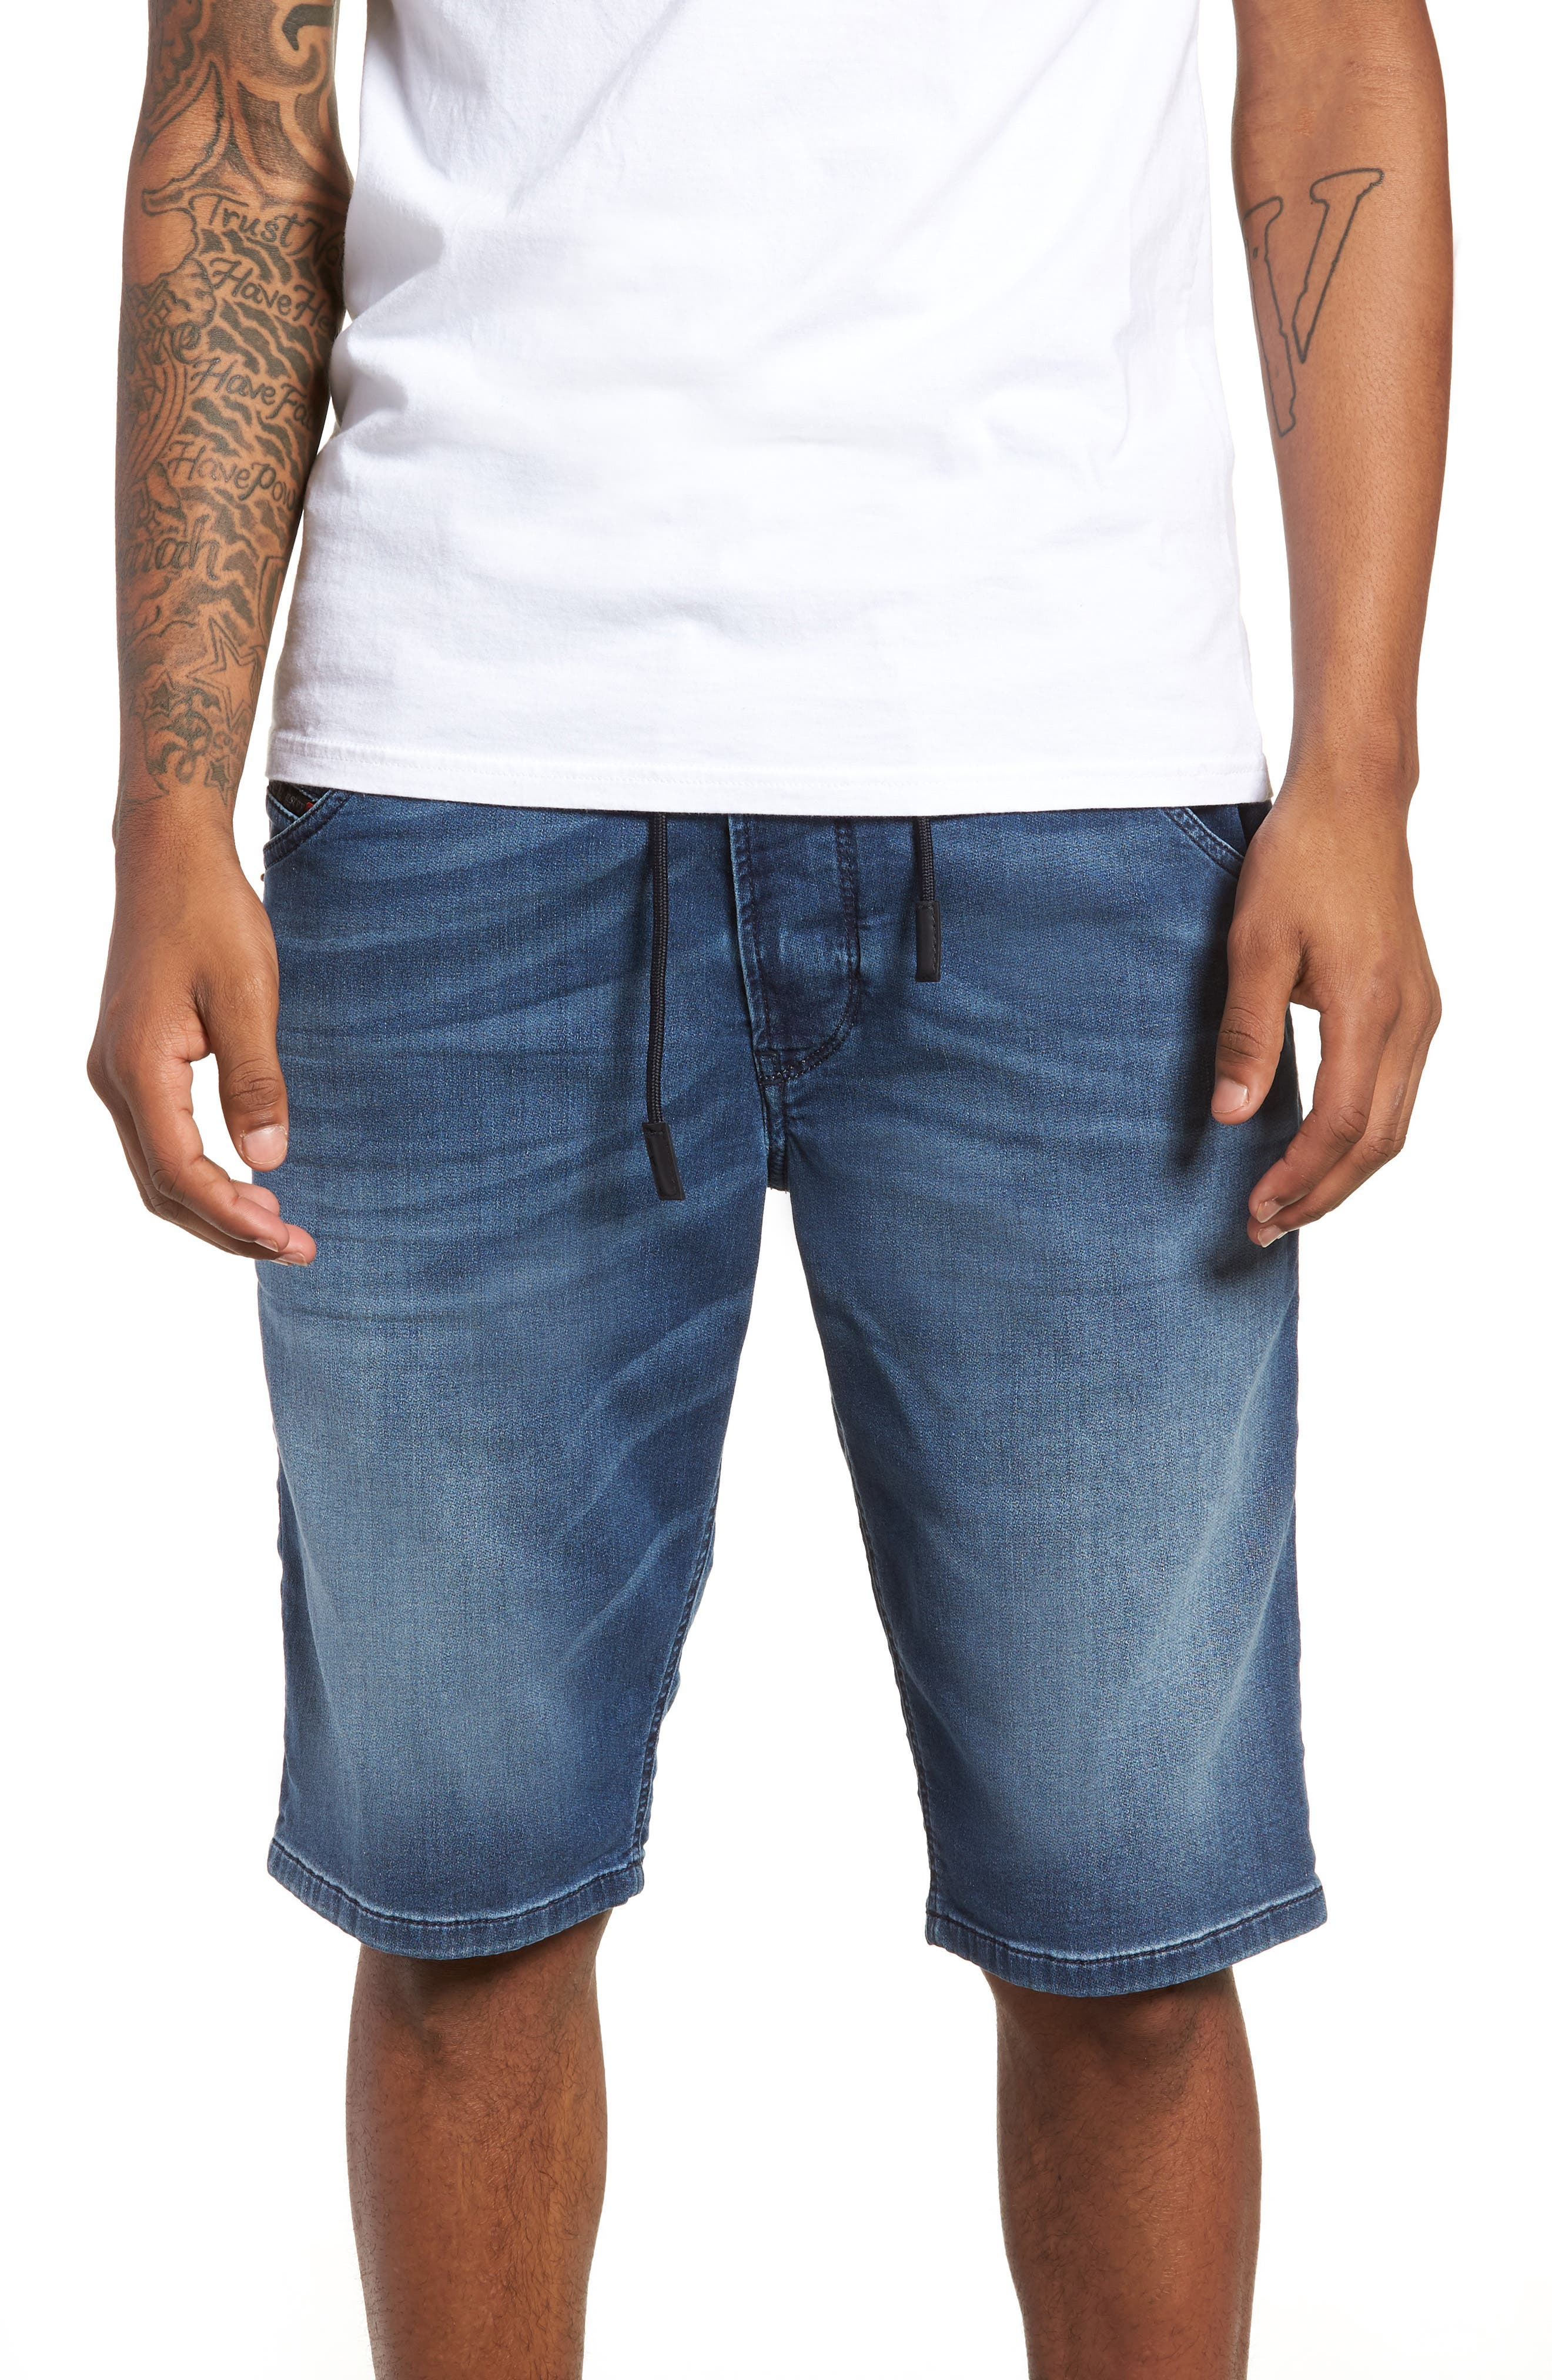 Krooshort Denim Shorts,                         Main,                         color,